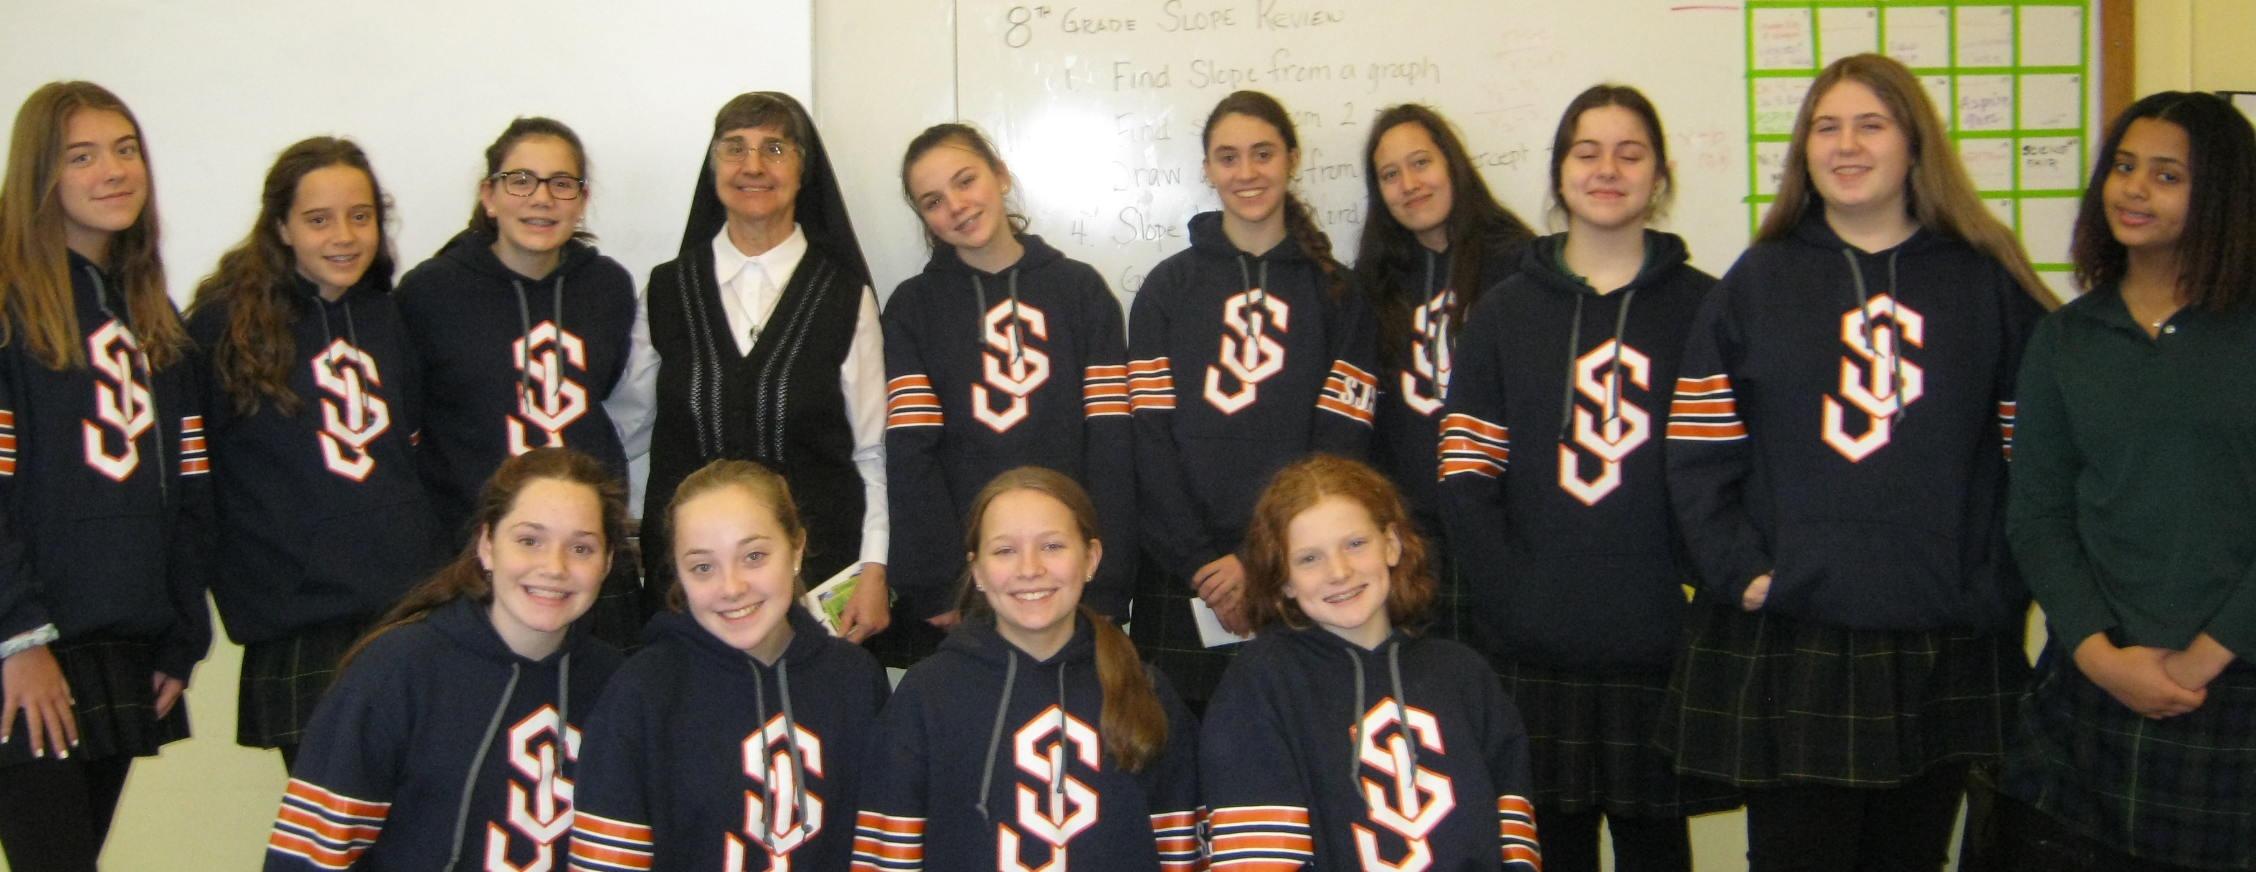 SDB 1 Jan 23c with 8th grade girls_edite